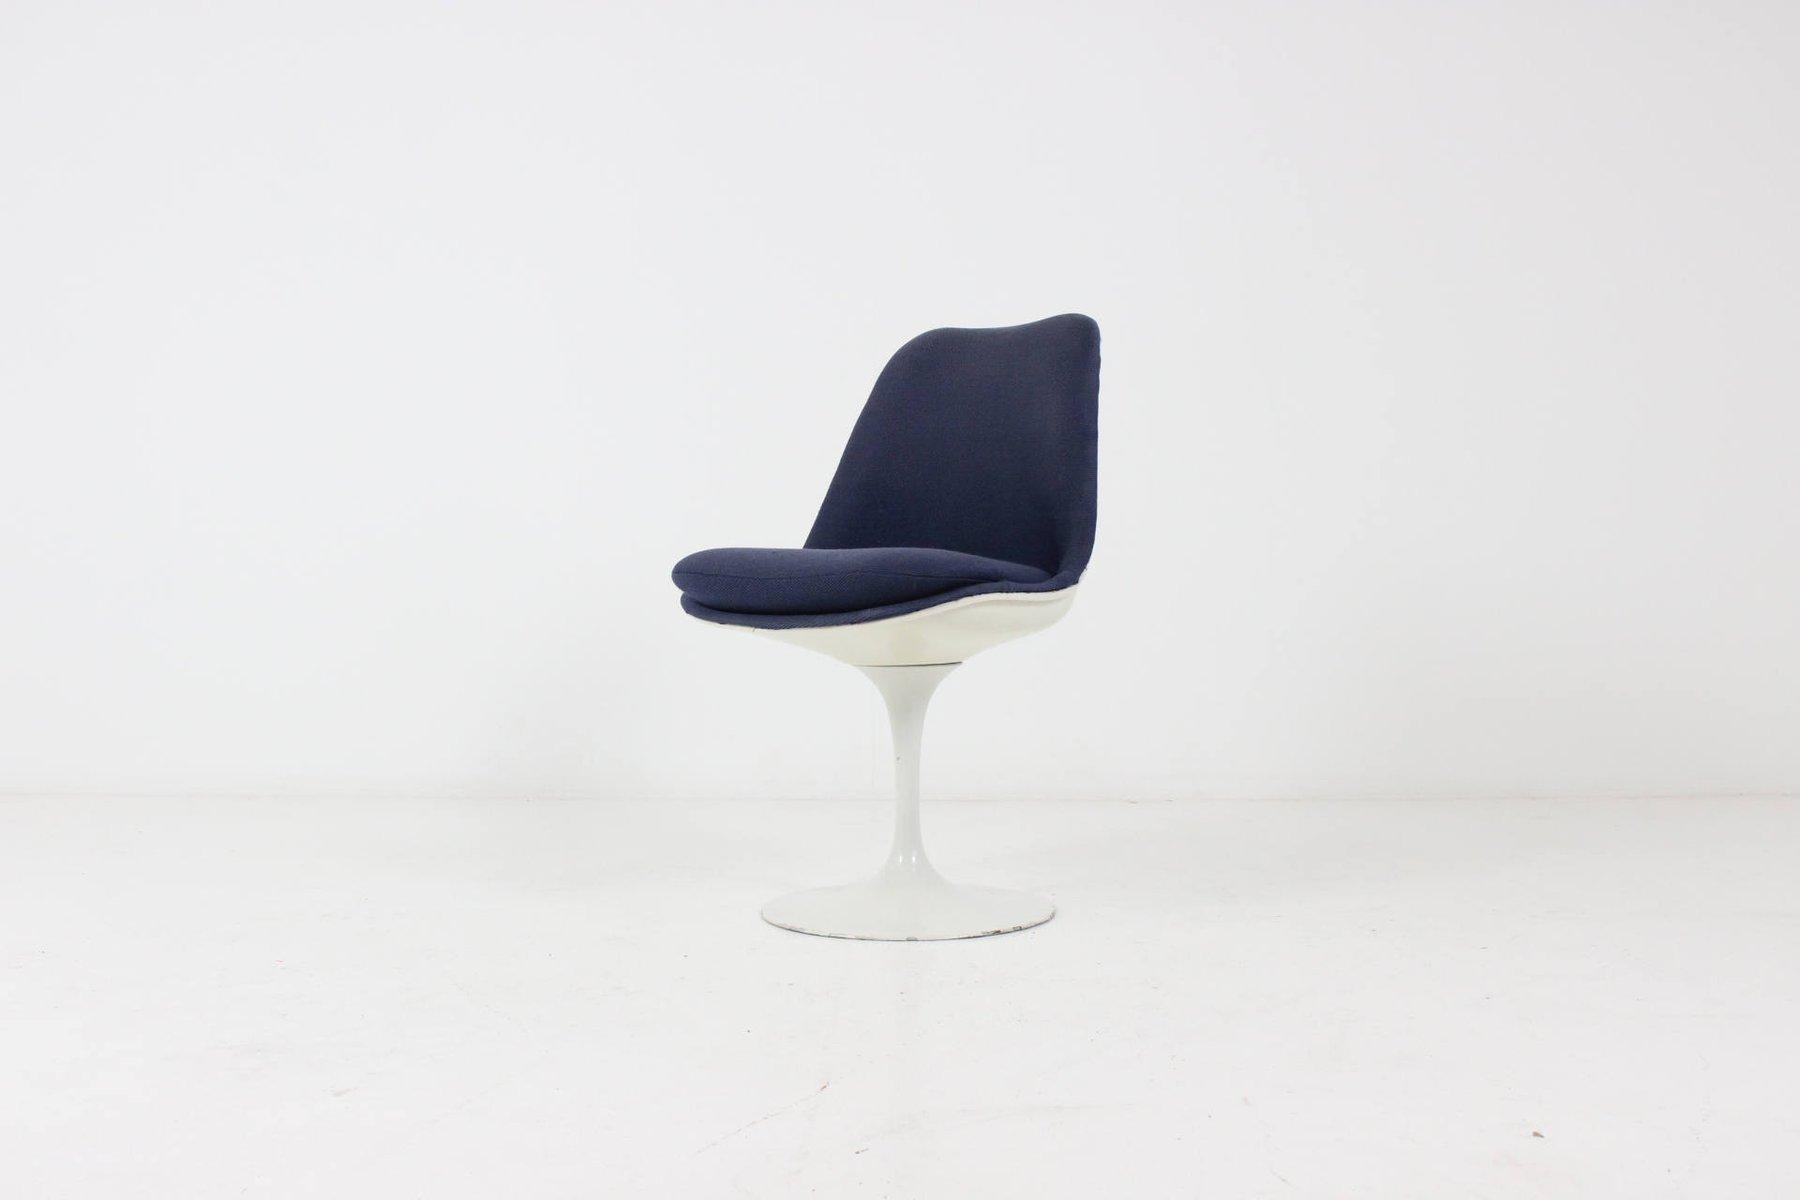 knoll chair bz product tulip arm k x